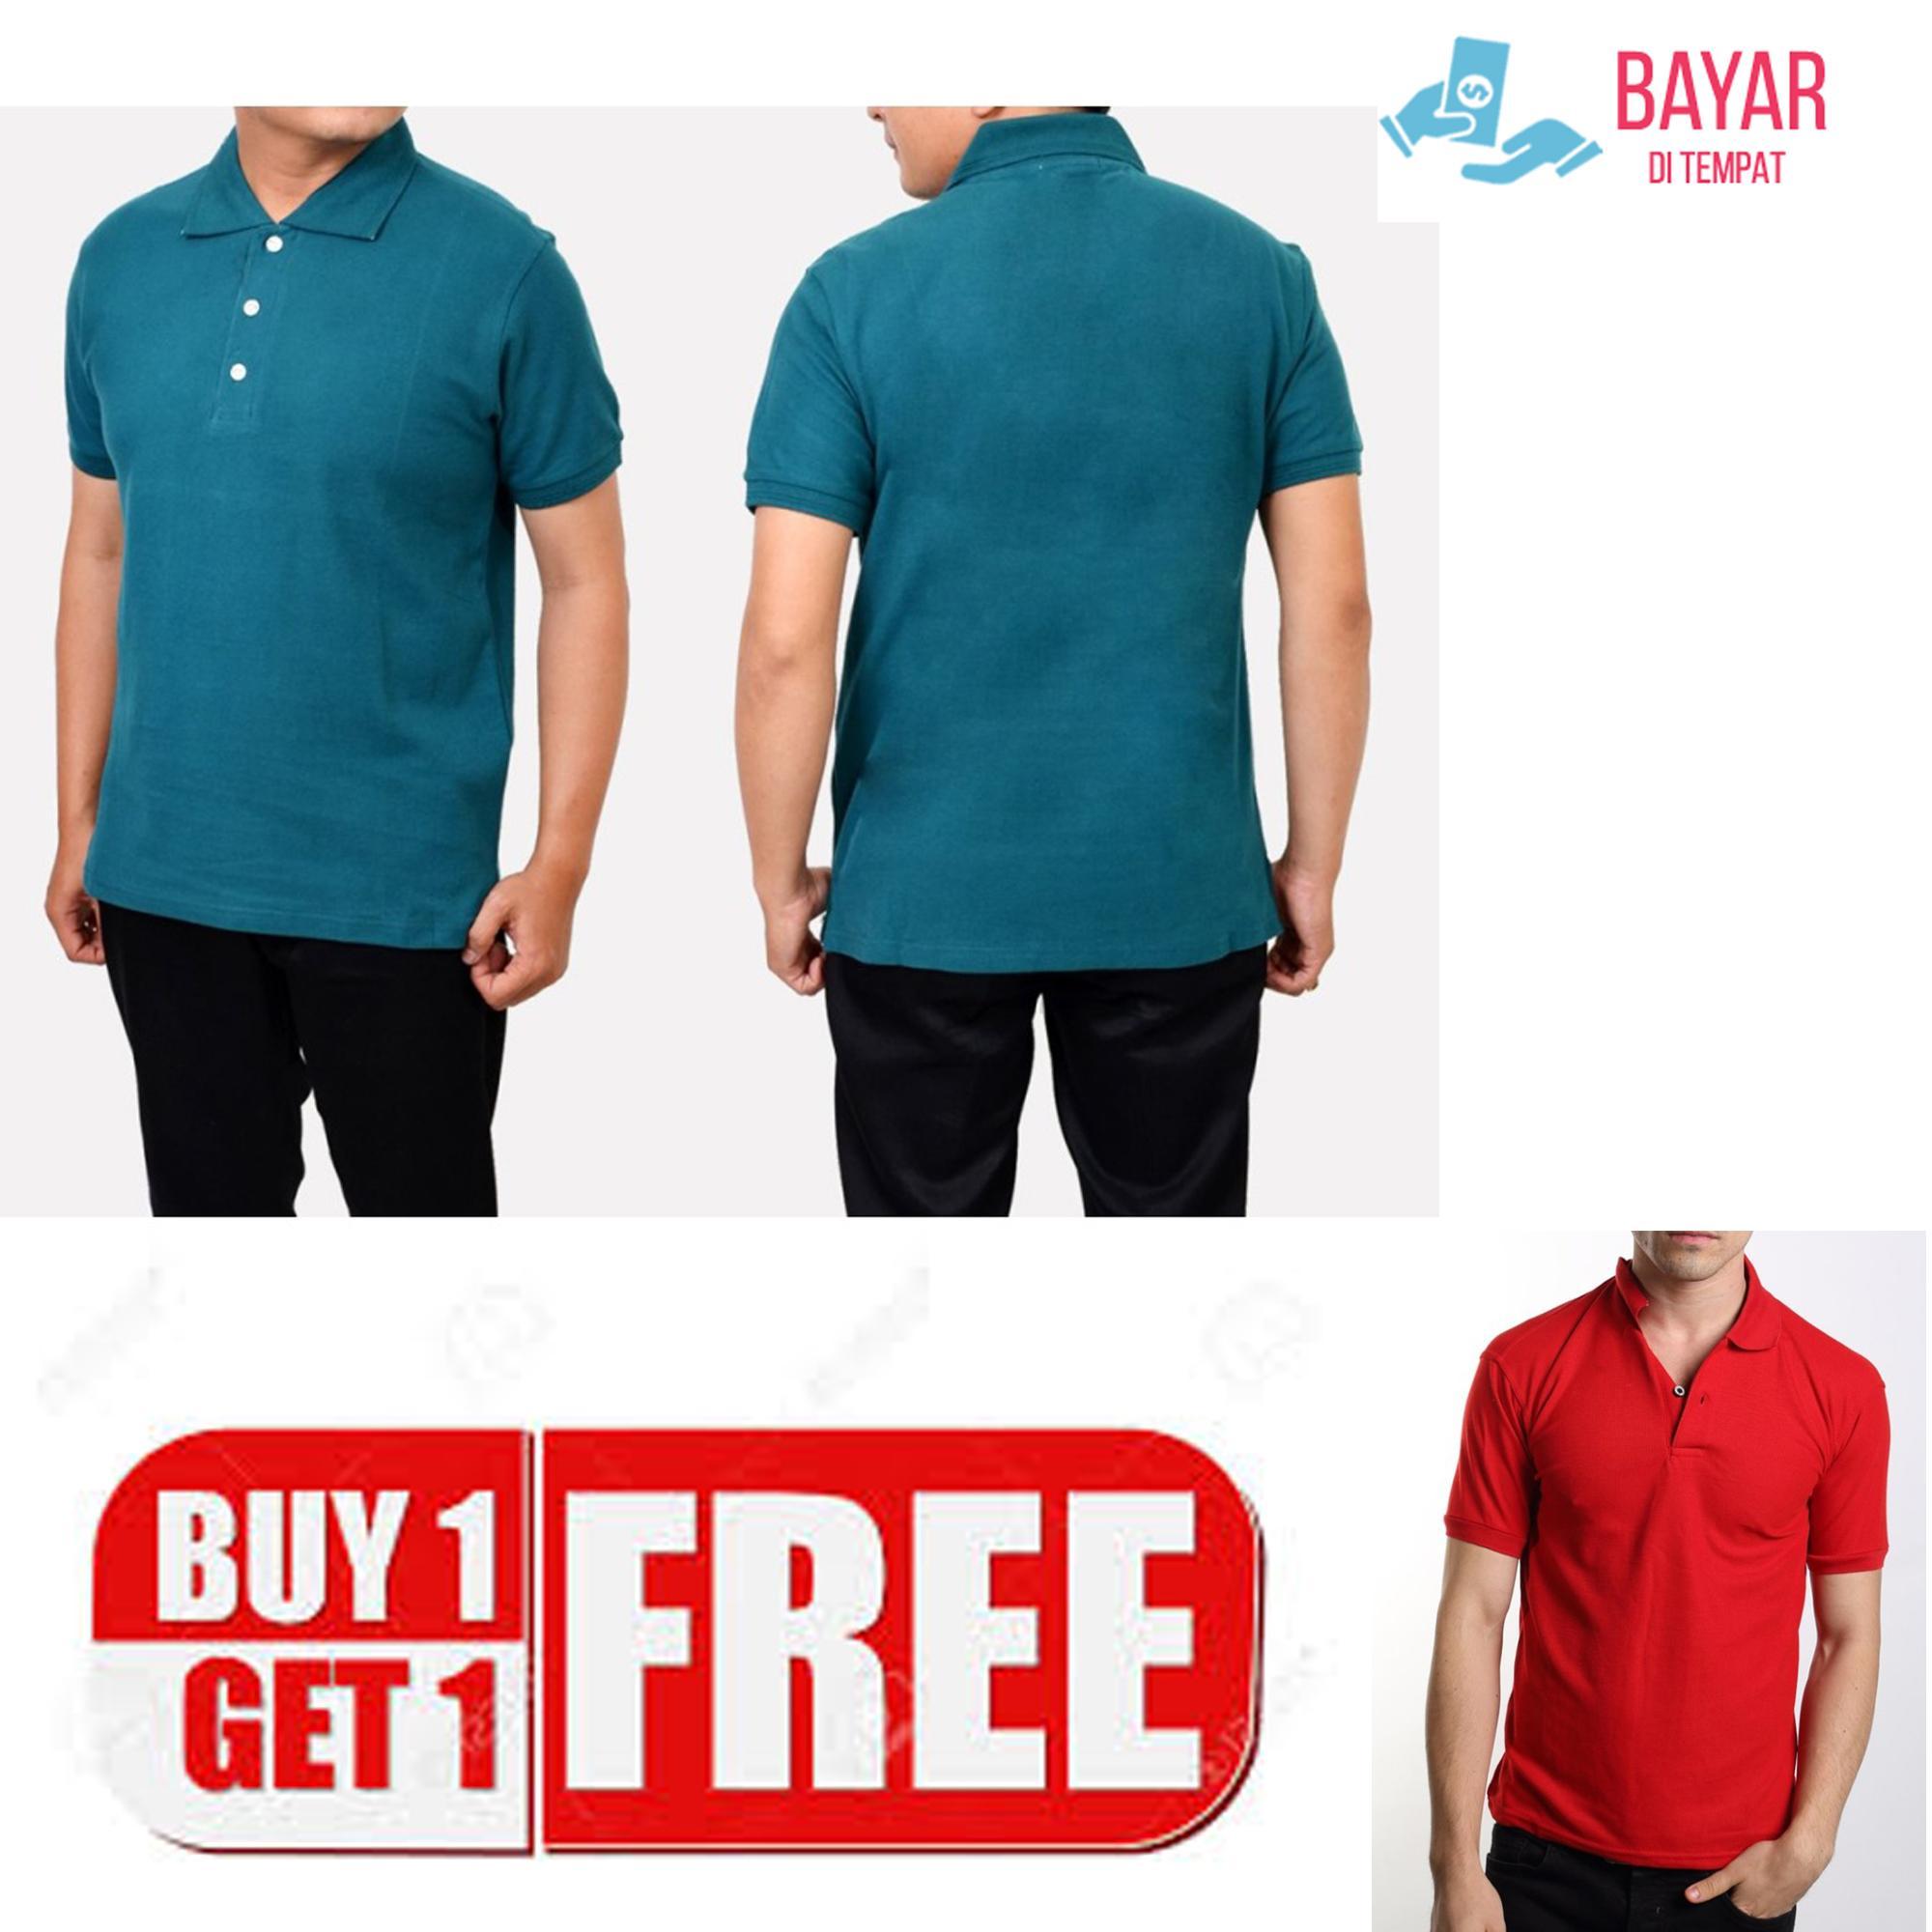 Jayasinar/Baju Polos Pria/Polo Shirt Pria/Fashion Pria/Buy 1 Get 1/Baju Kaos Model Terbaru Murah